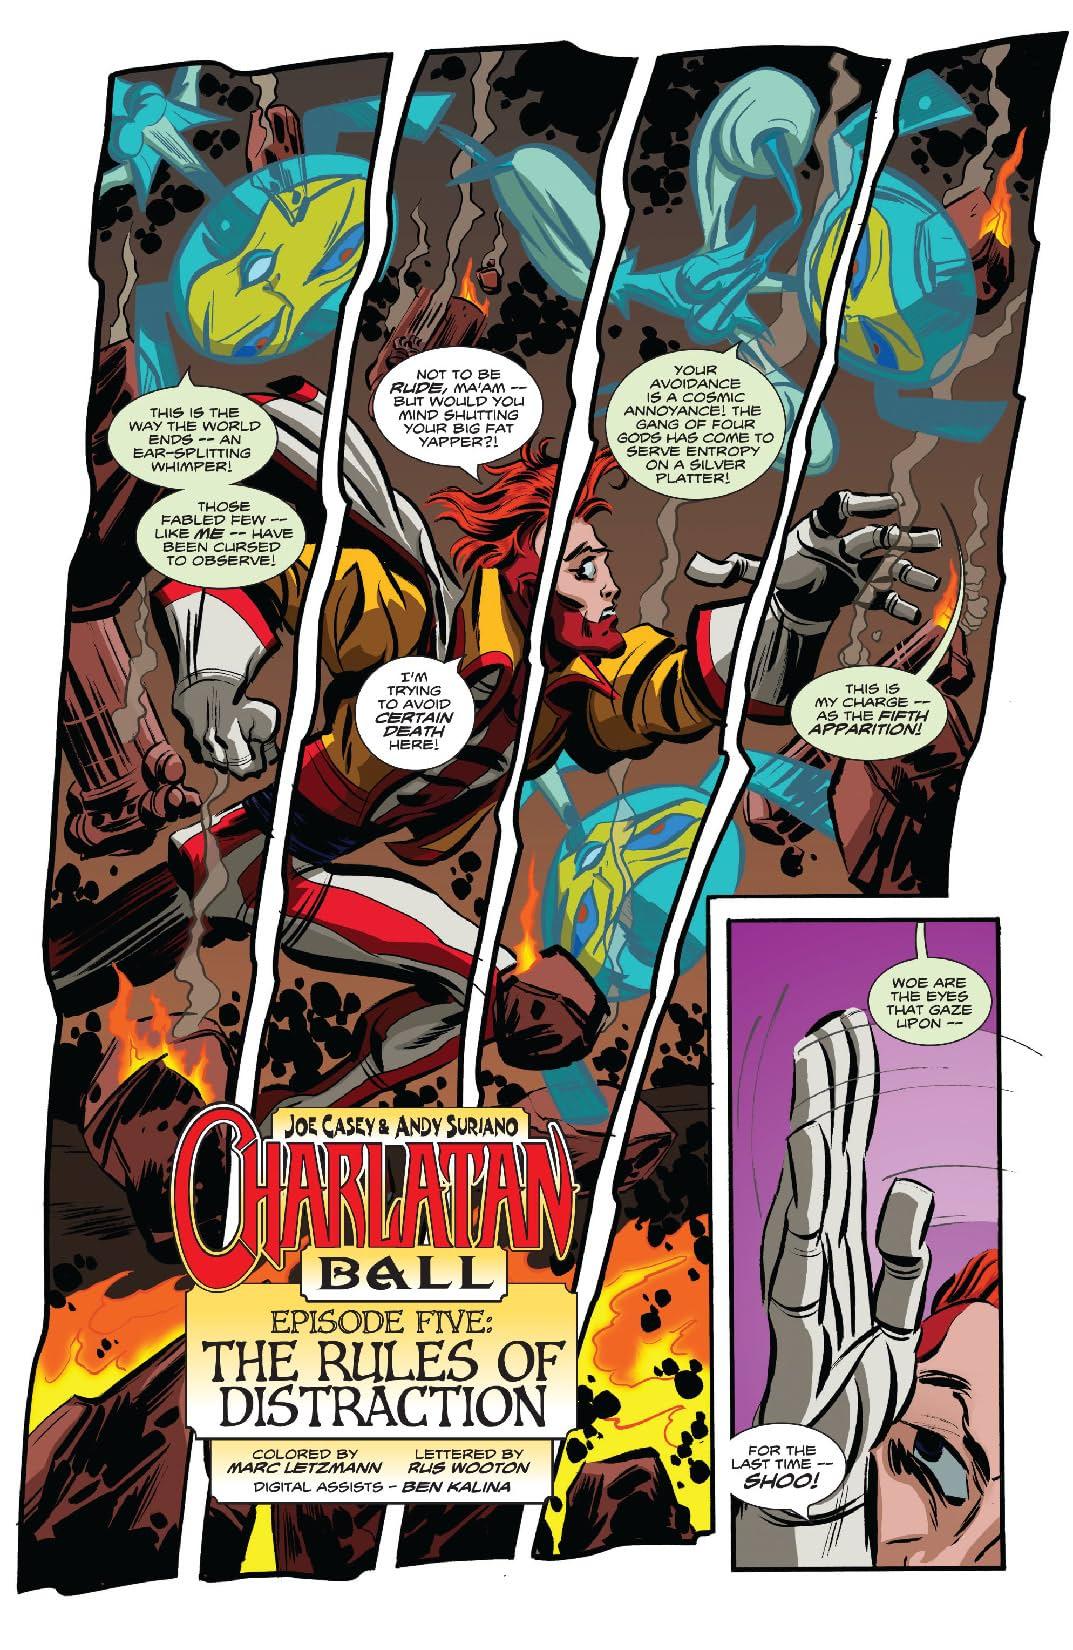 Charlatan Ball #5